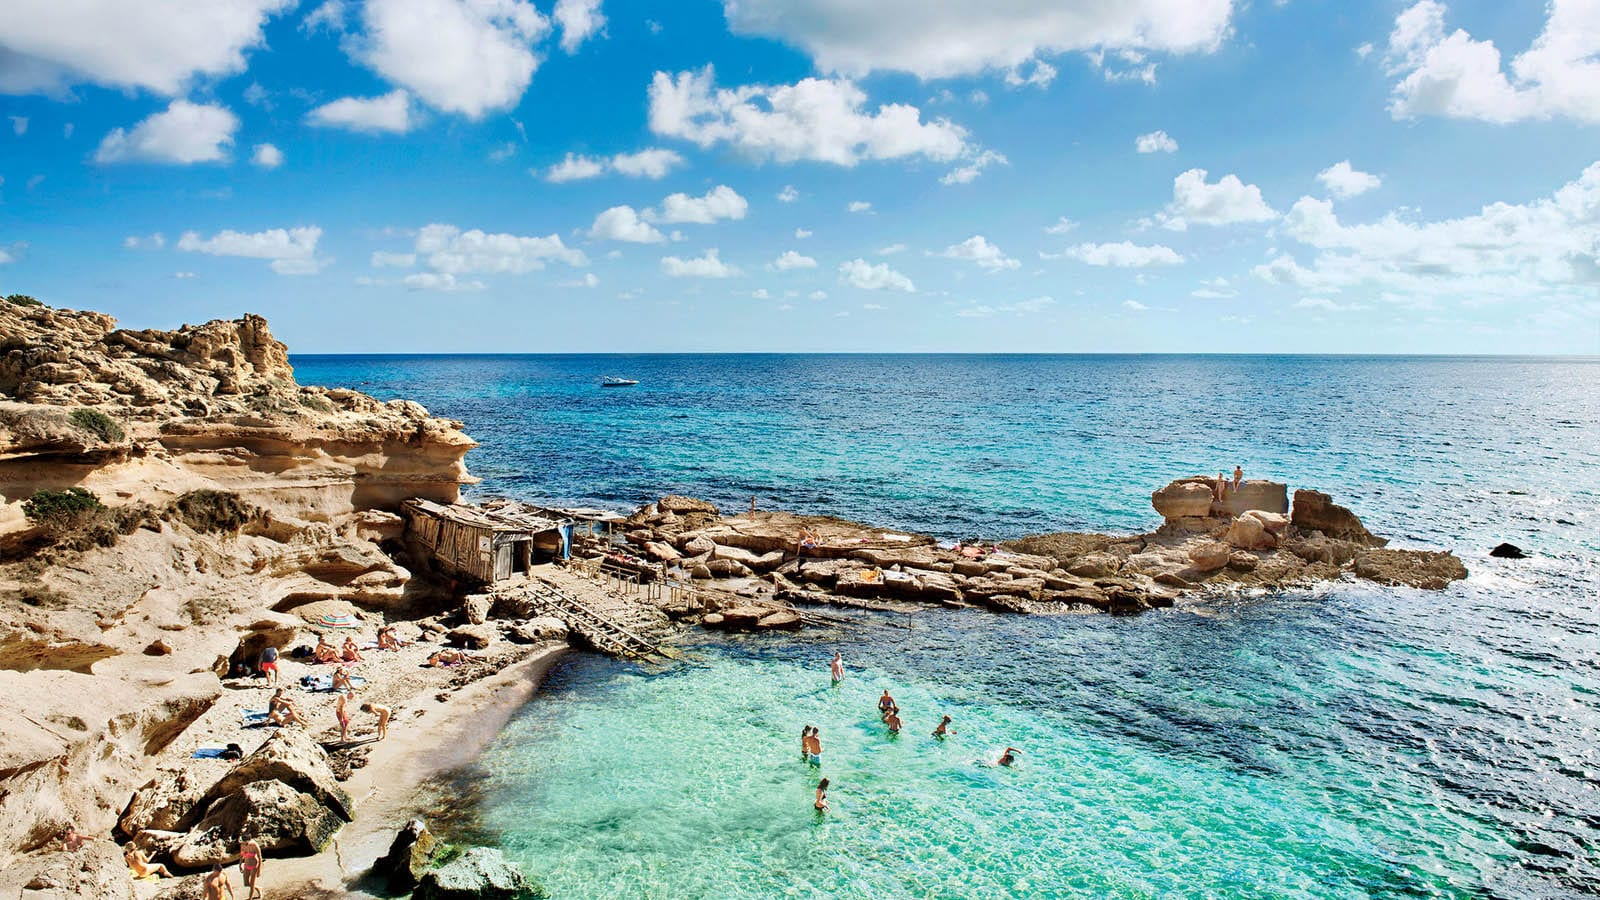 Форментера: Спокойная гавань Балеарского архипелага